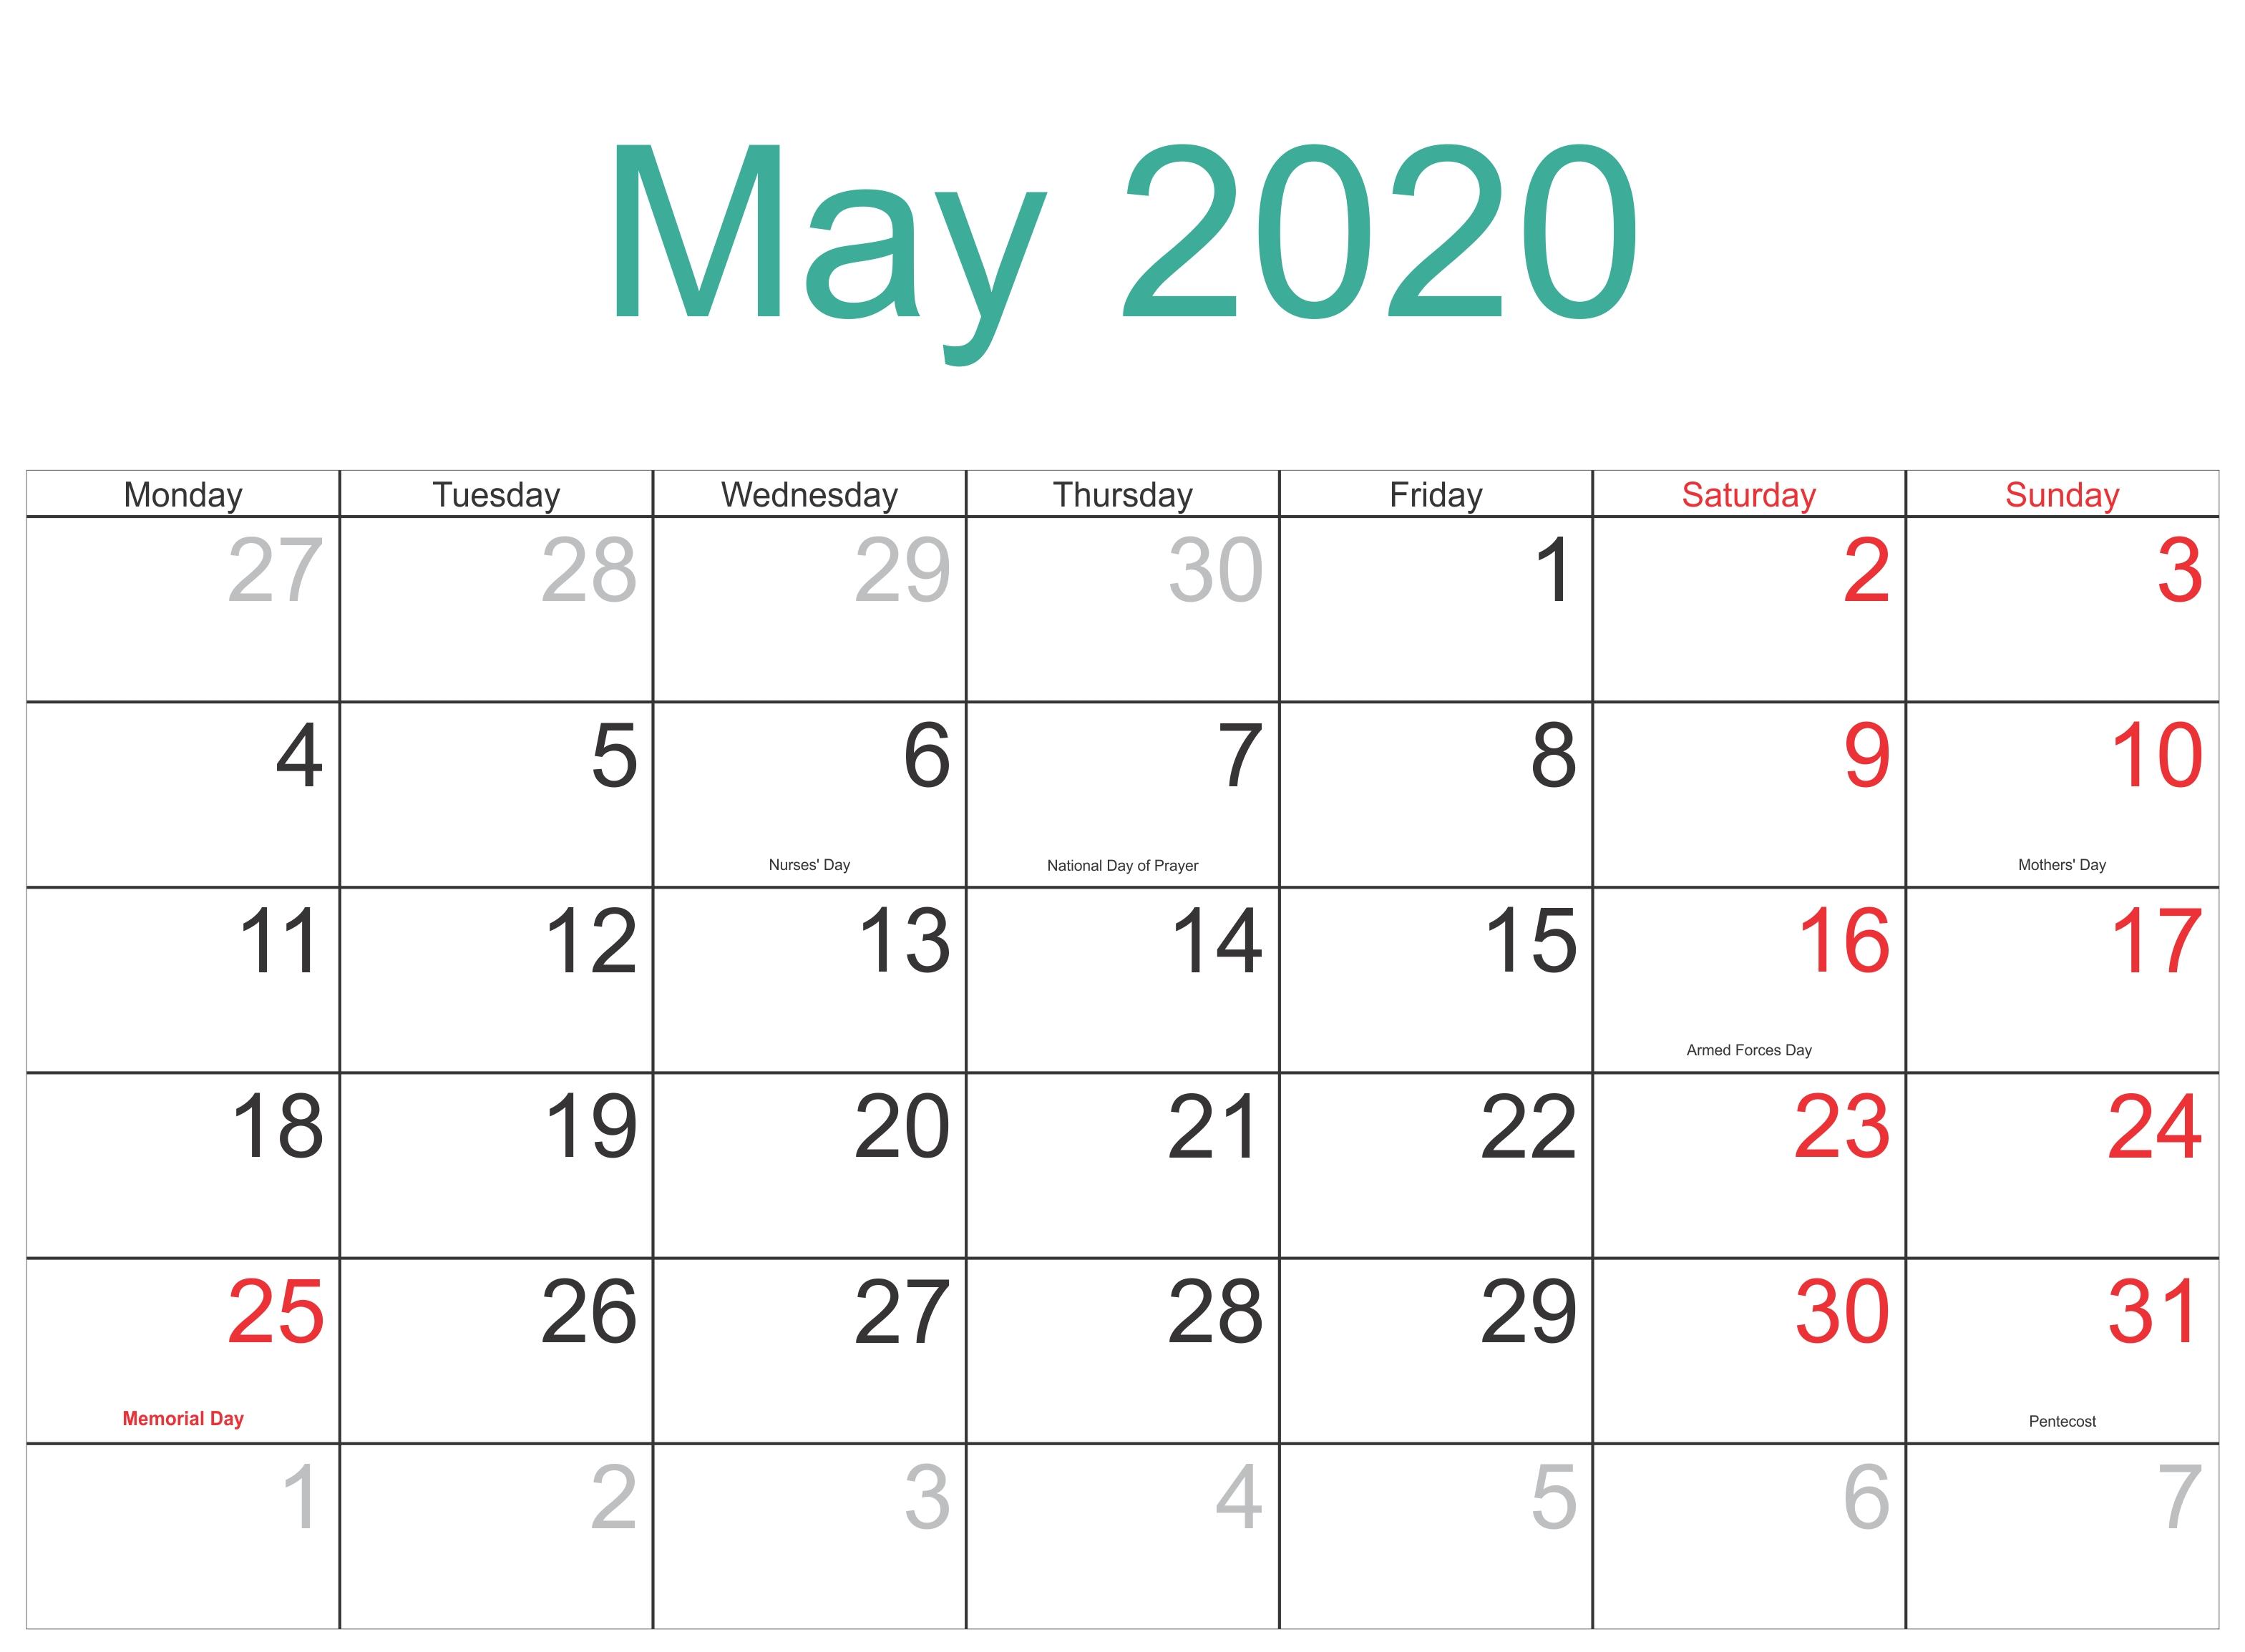 May 2020 Holidays Calendar Usa, Uk, Canada, India, Australia